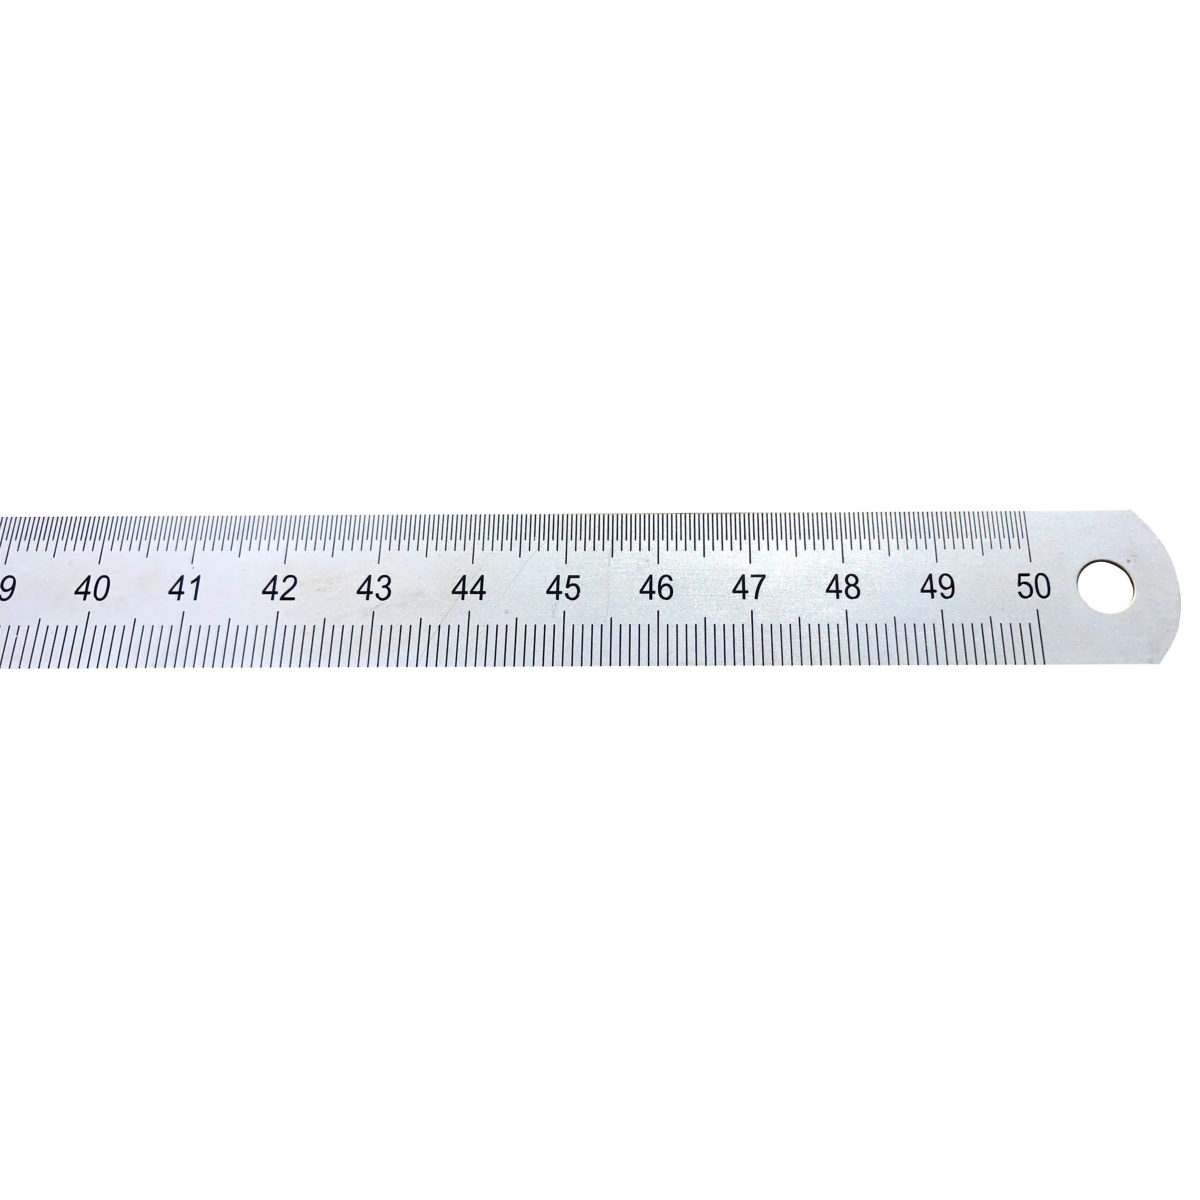 gm Stahlmaßstab 500 mm in Draufsicht